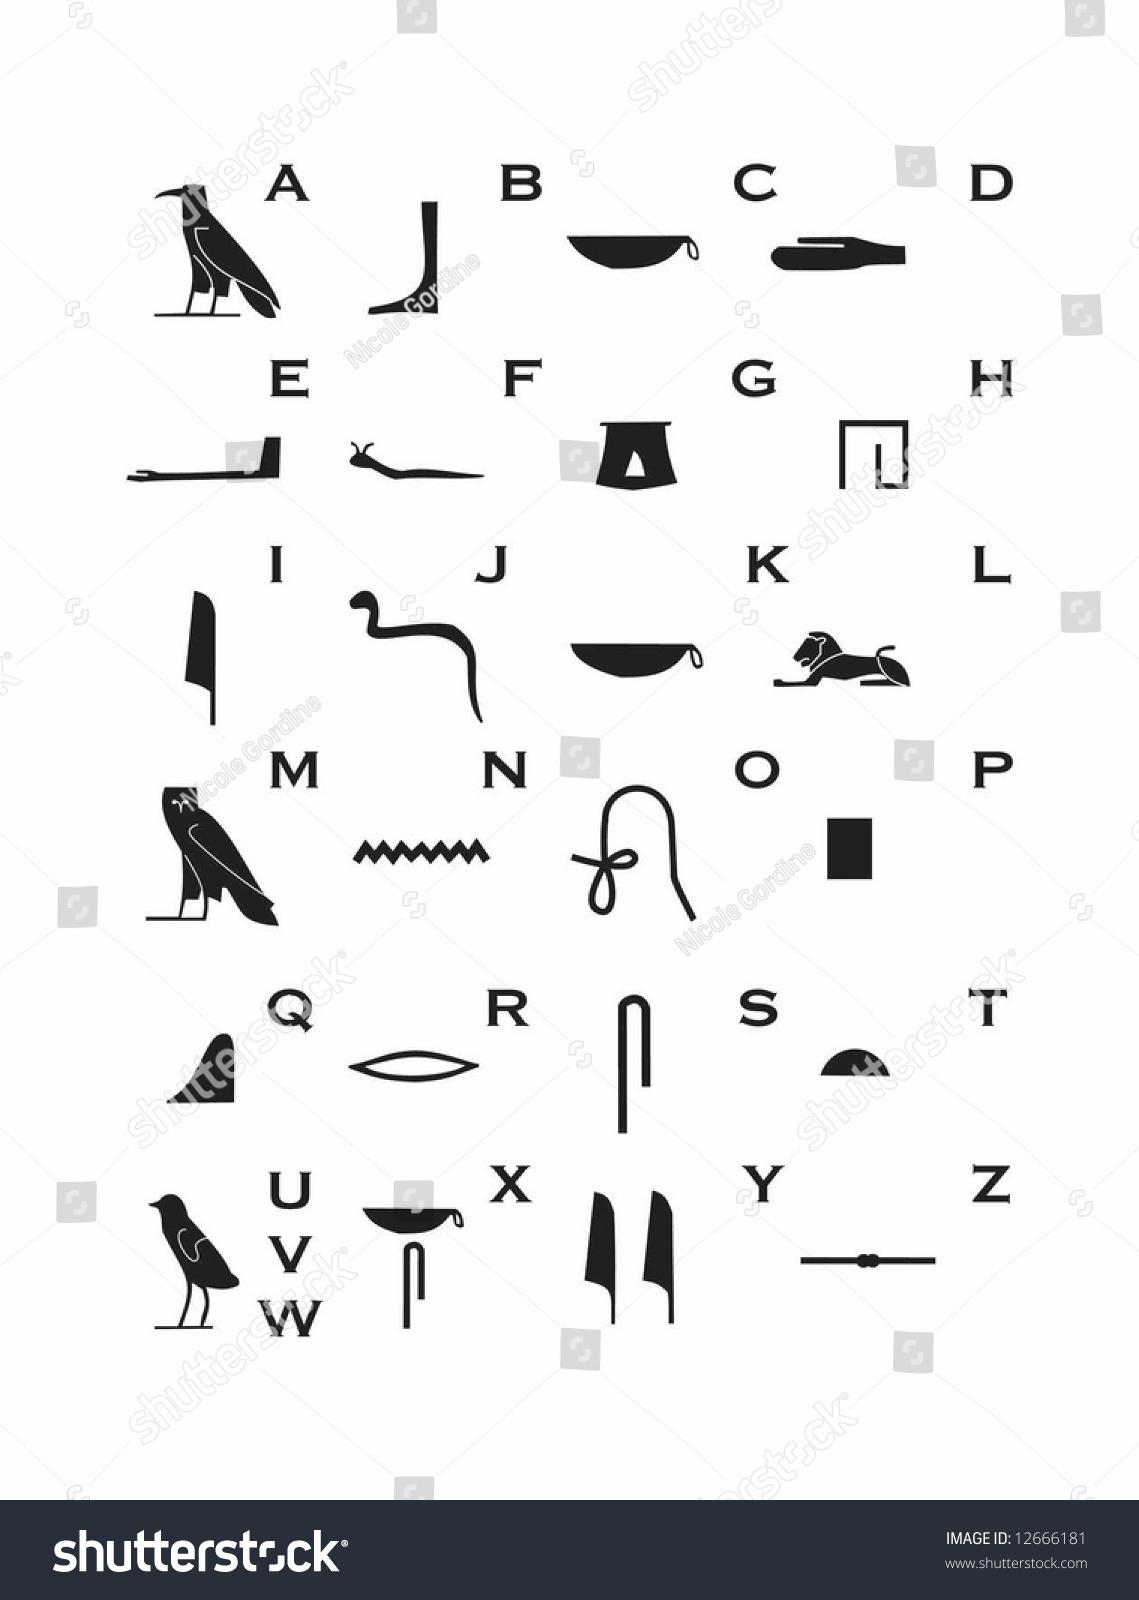 Hieroglyphic alphabet stock vector 12666181 shutterstock hieroglyphic alphabet thecheapjerseys Gallery